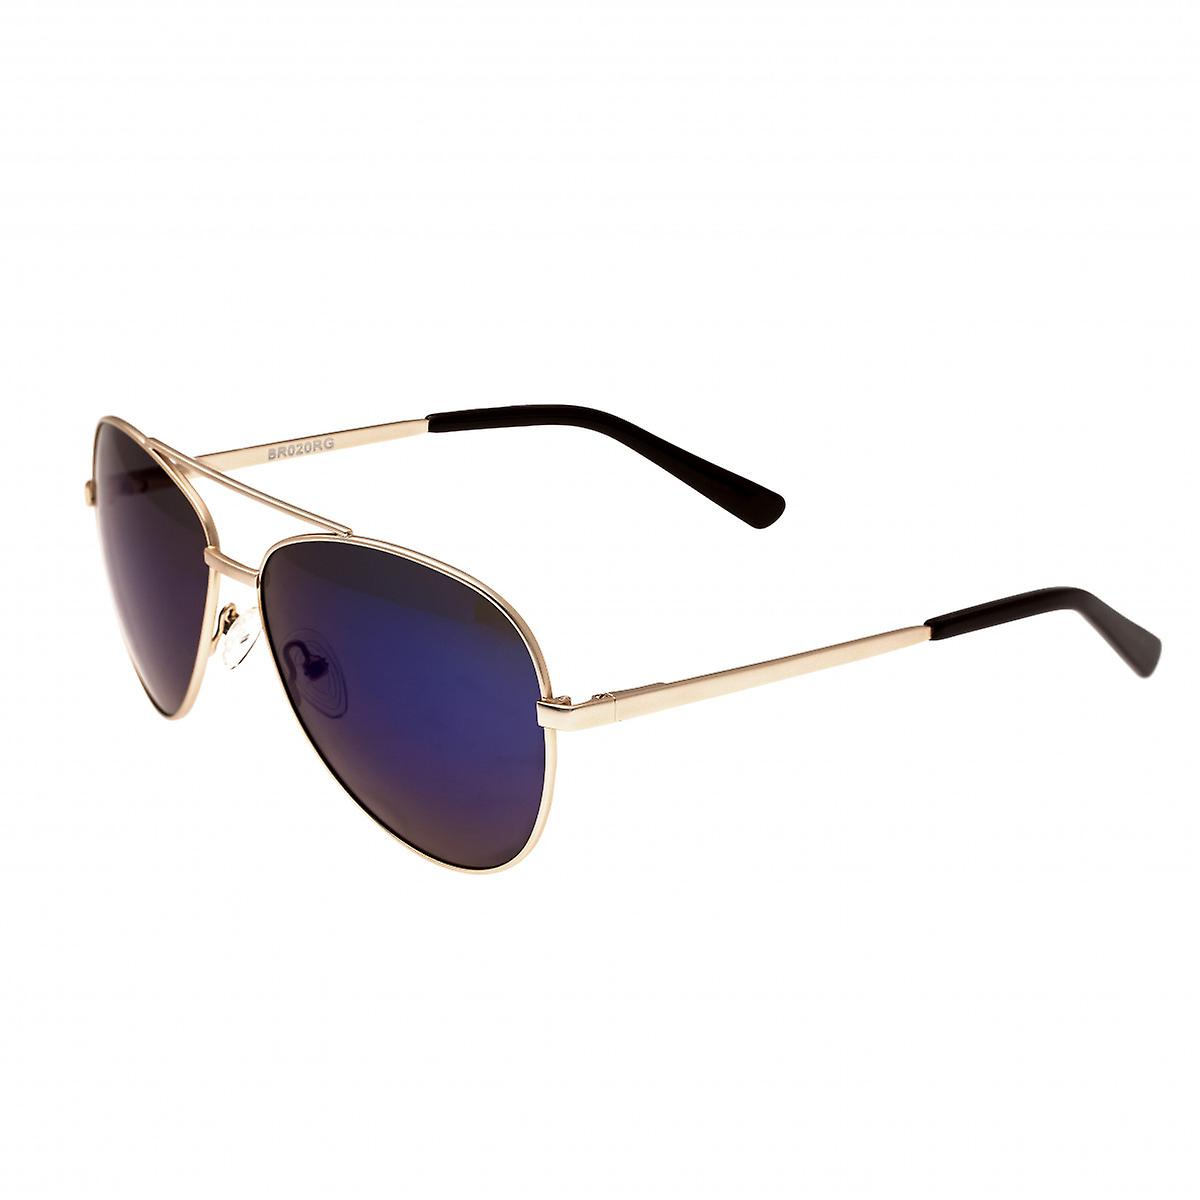 Bertha blanc Polarized Sunglasses - or violet-bleu